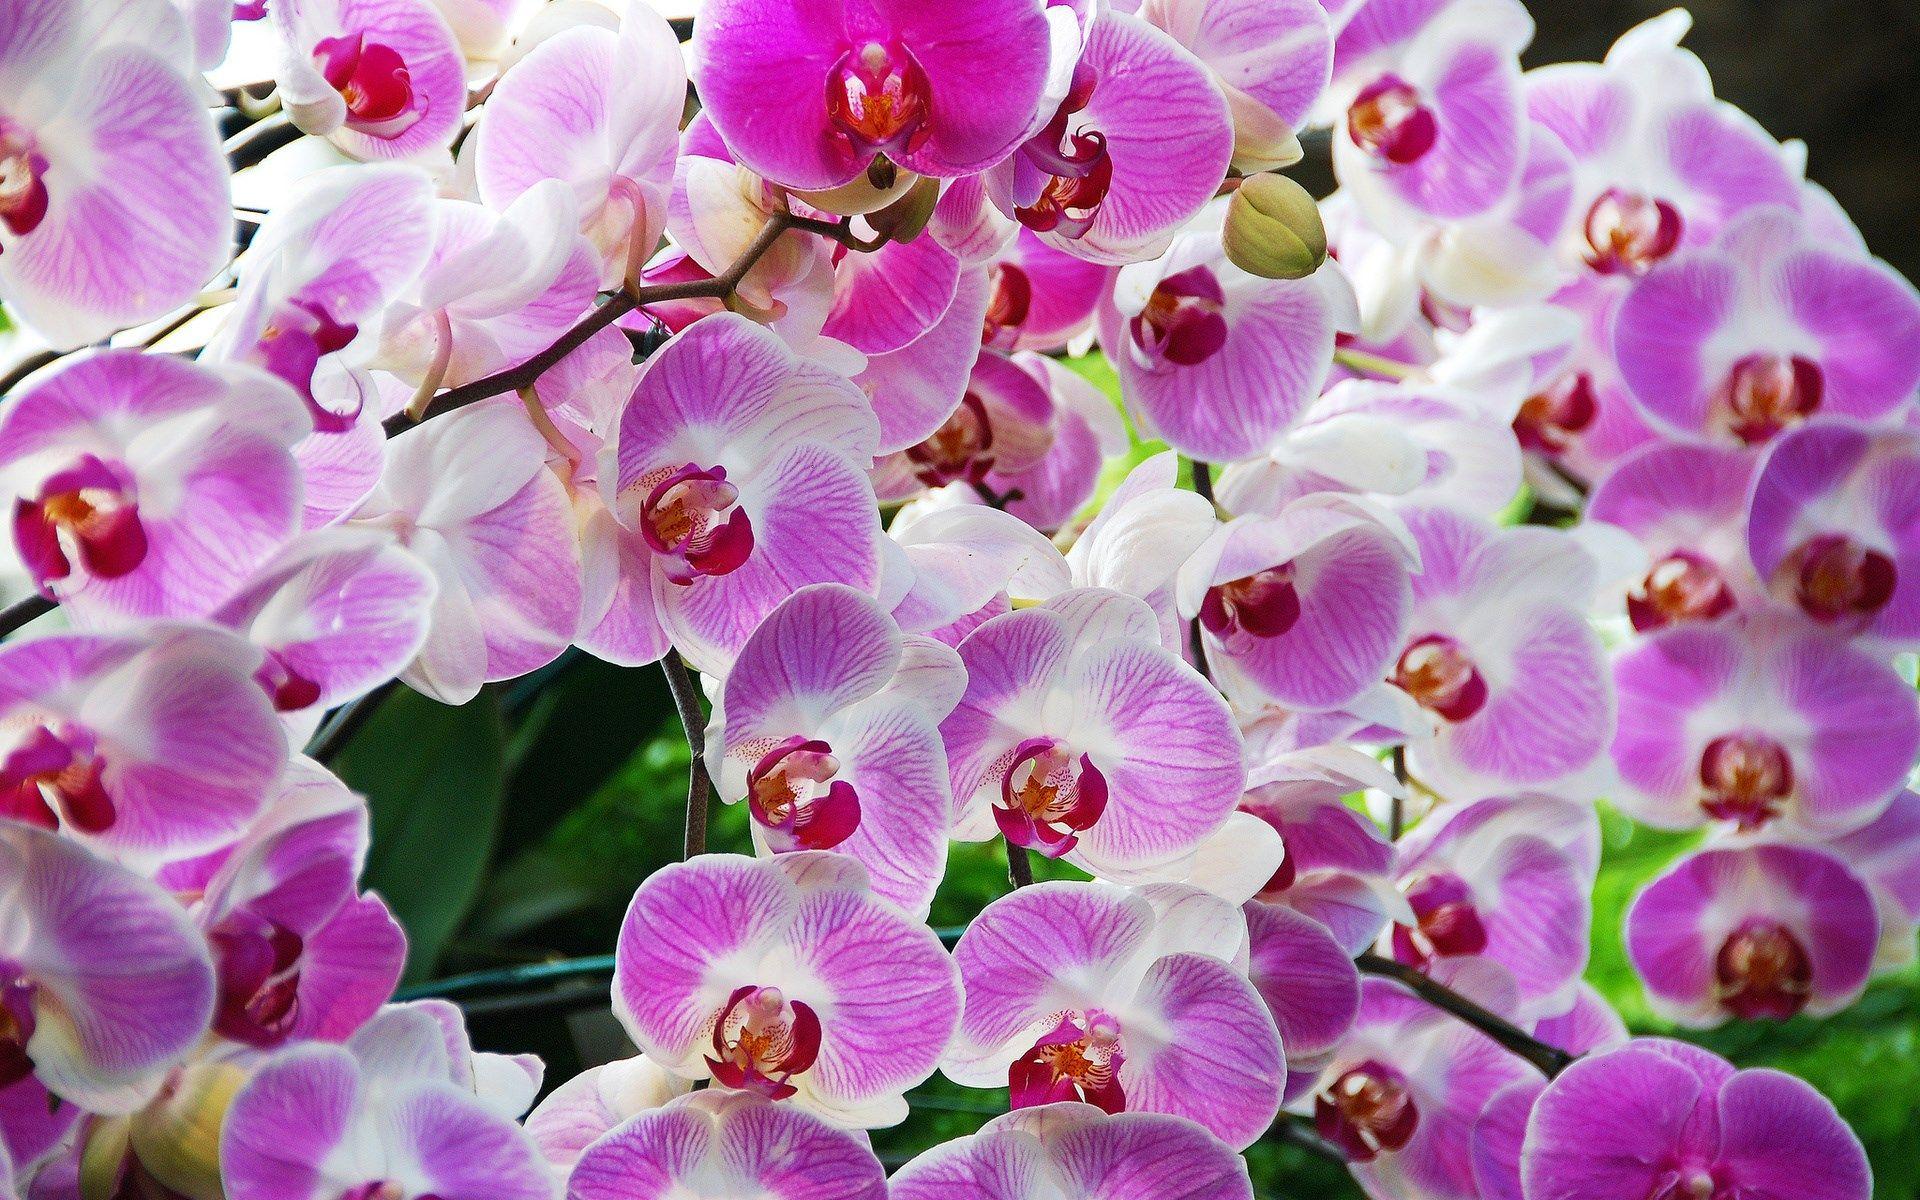 Orchid wallpaper backgrounds hd x kb gogolmogol